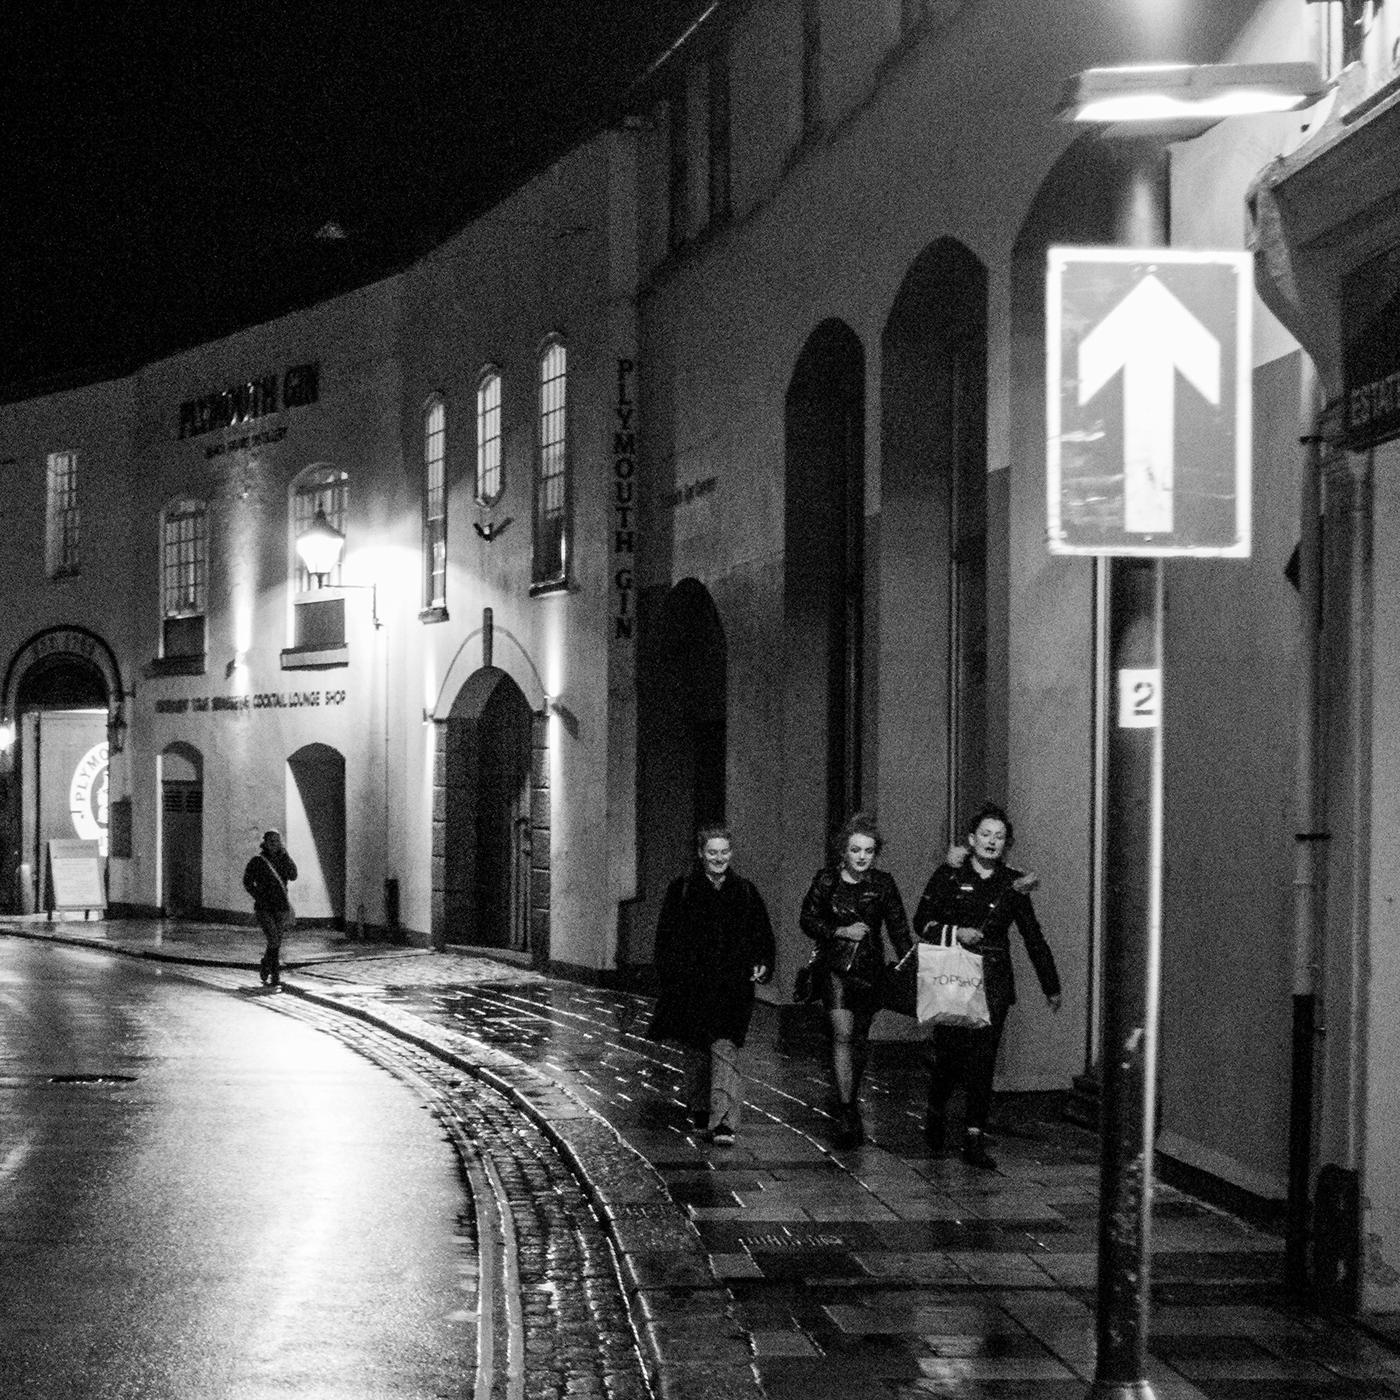 Street Life after dark.